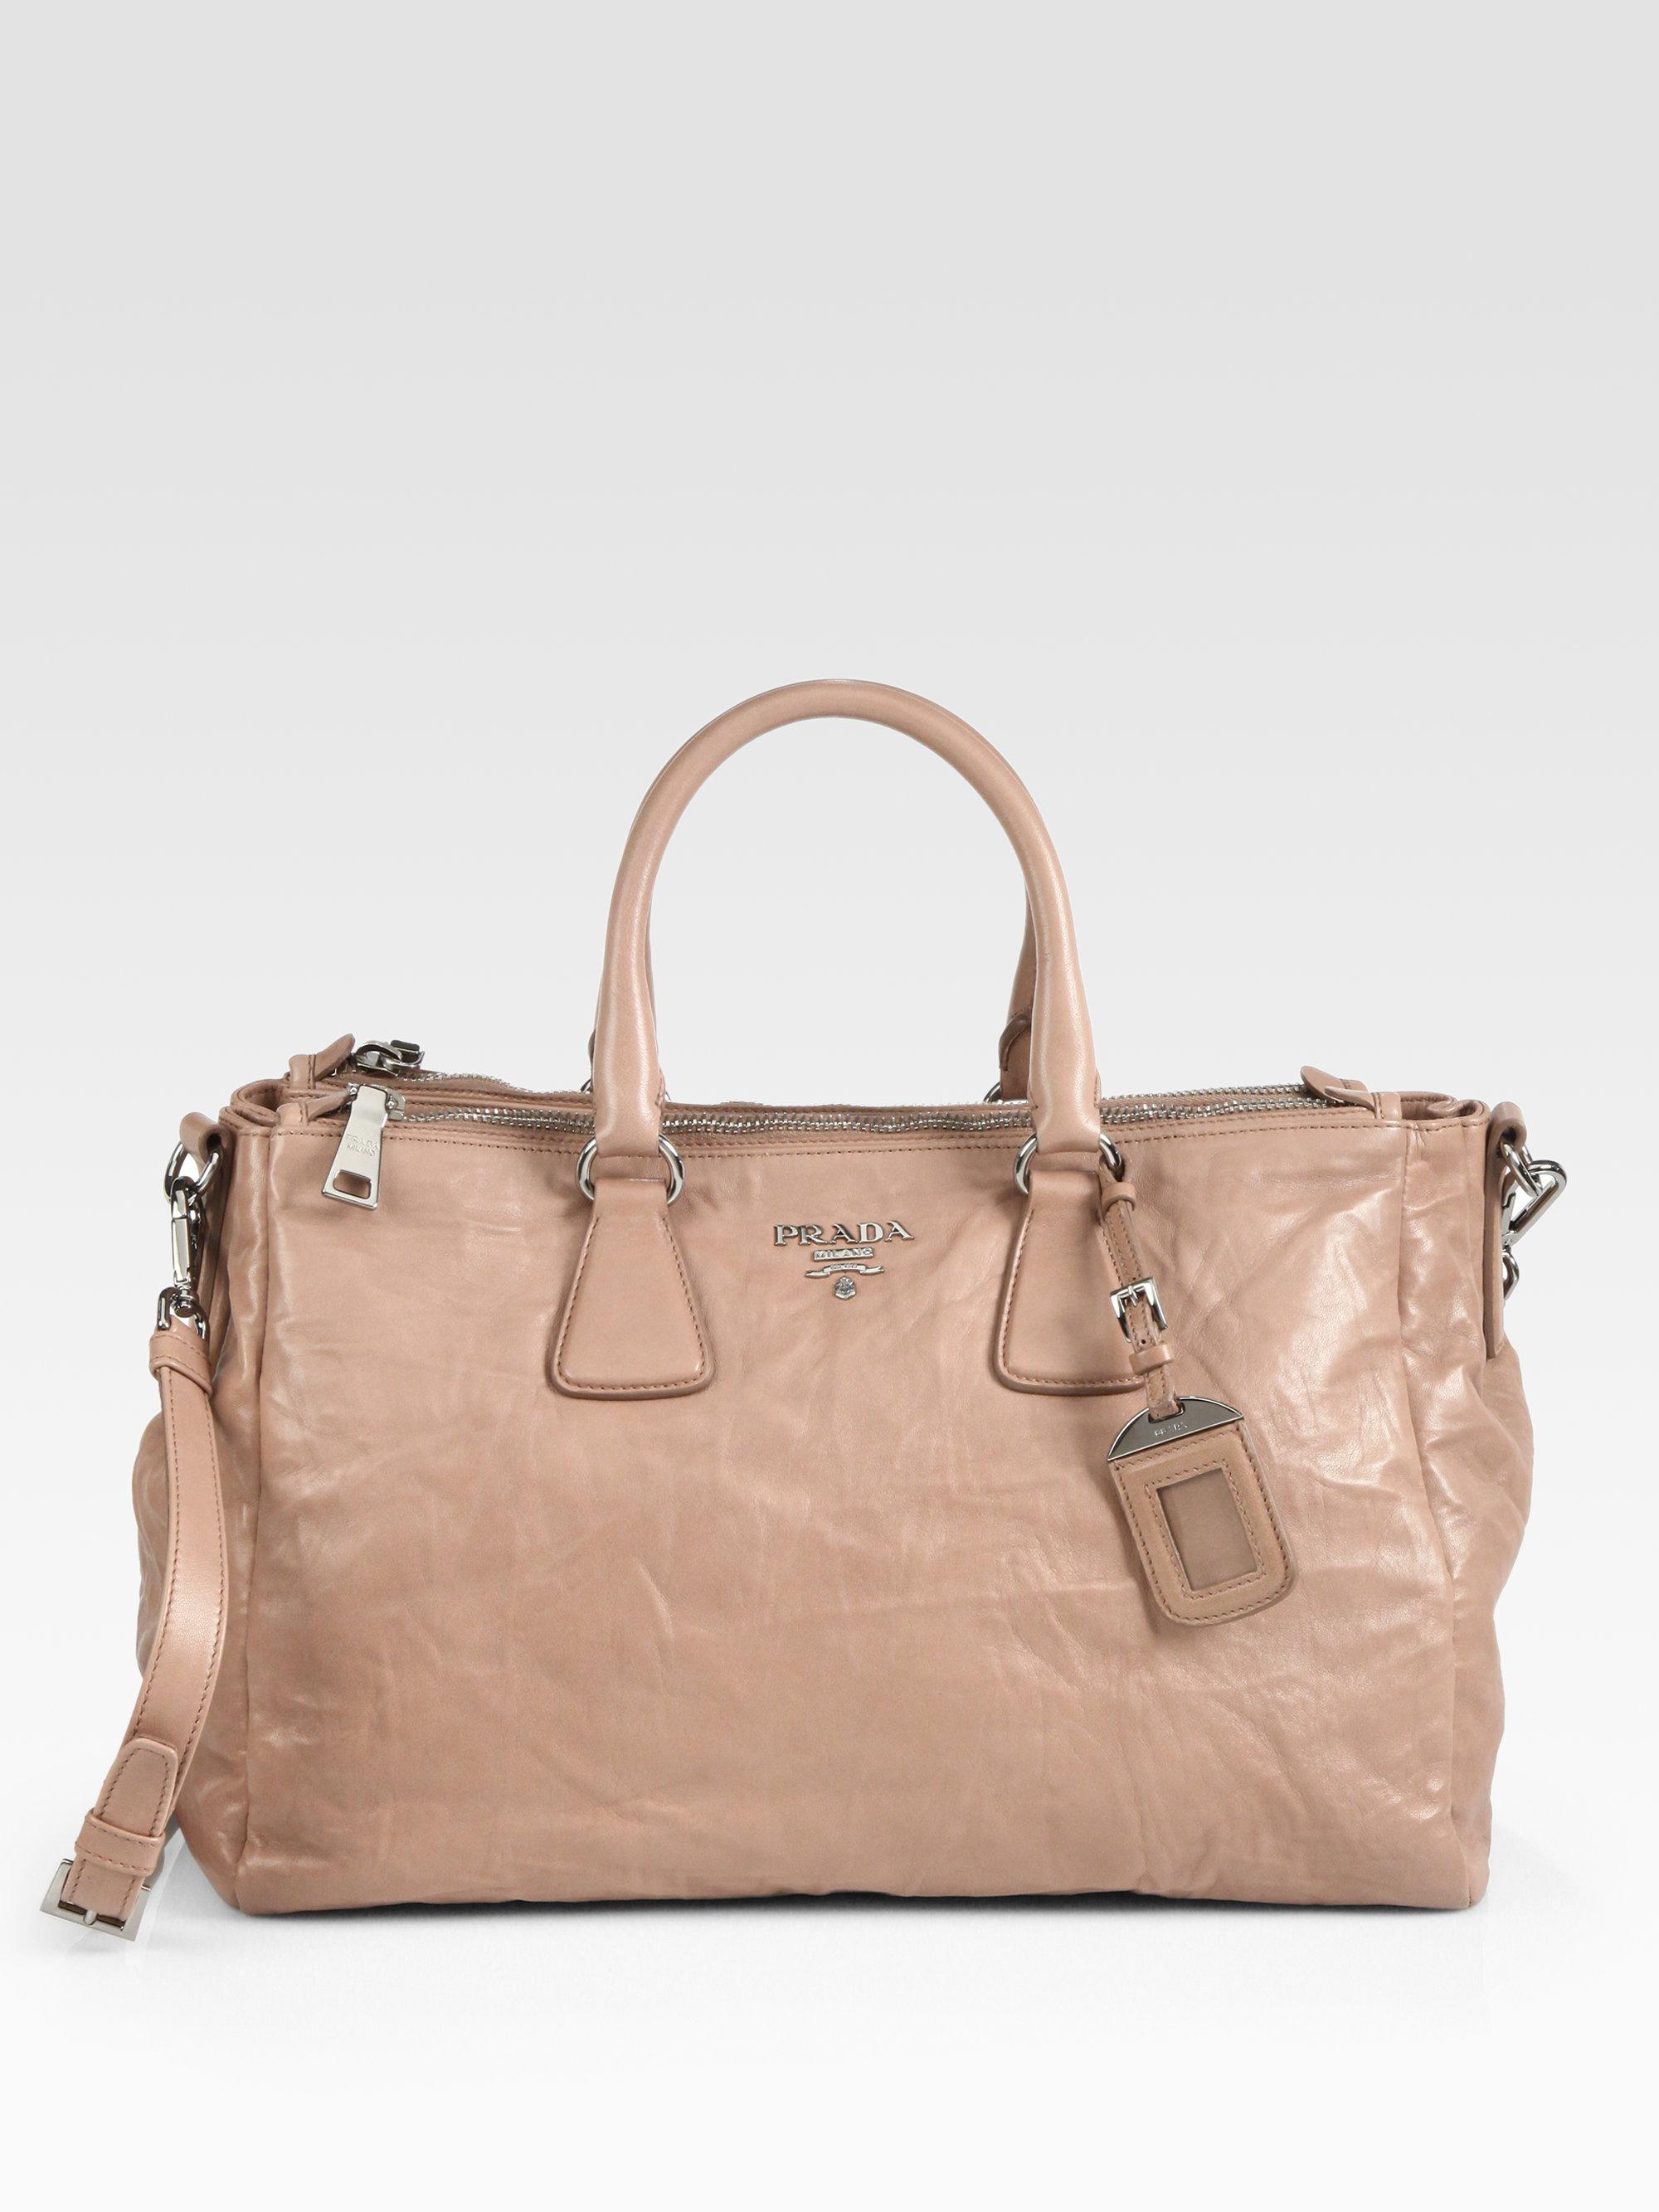 prada handbags for sale online - prada nappa tote, prada ostrich purse